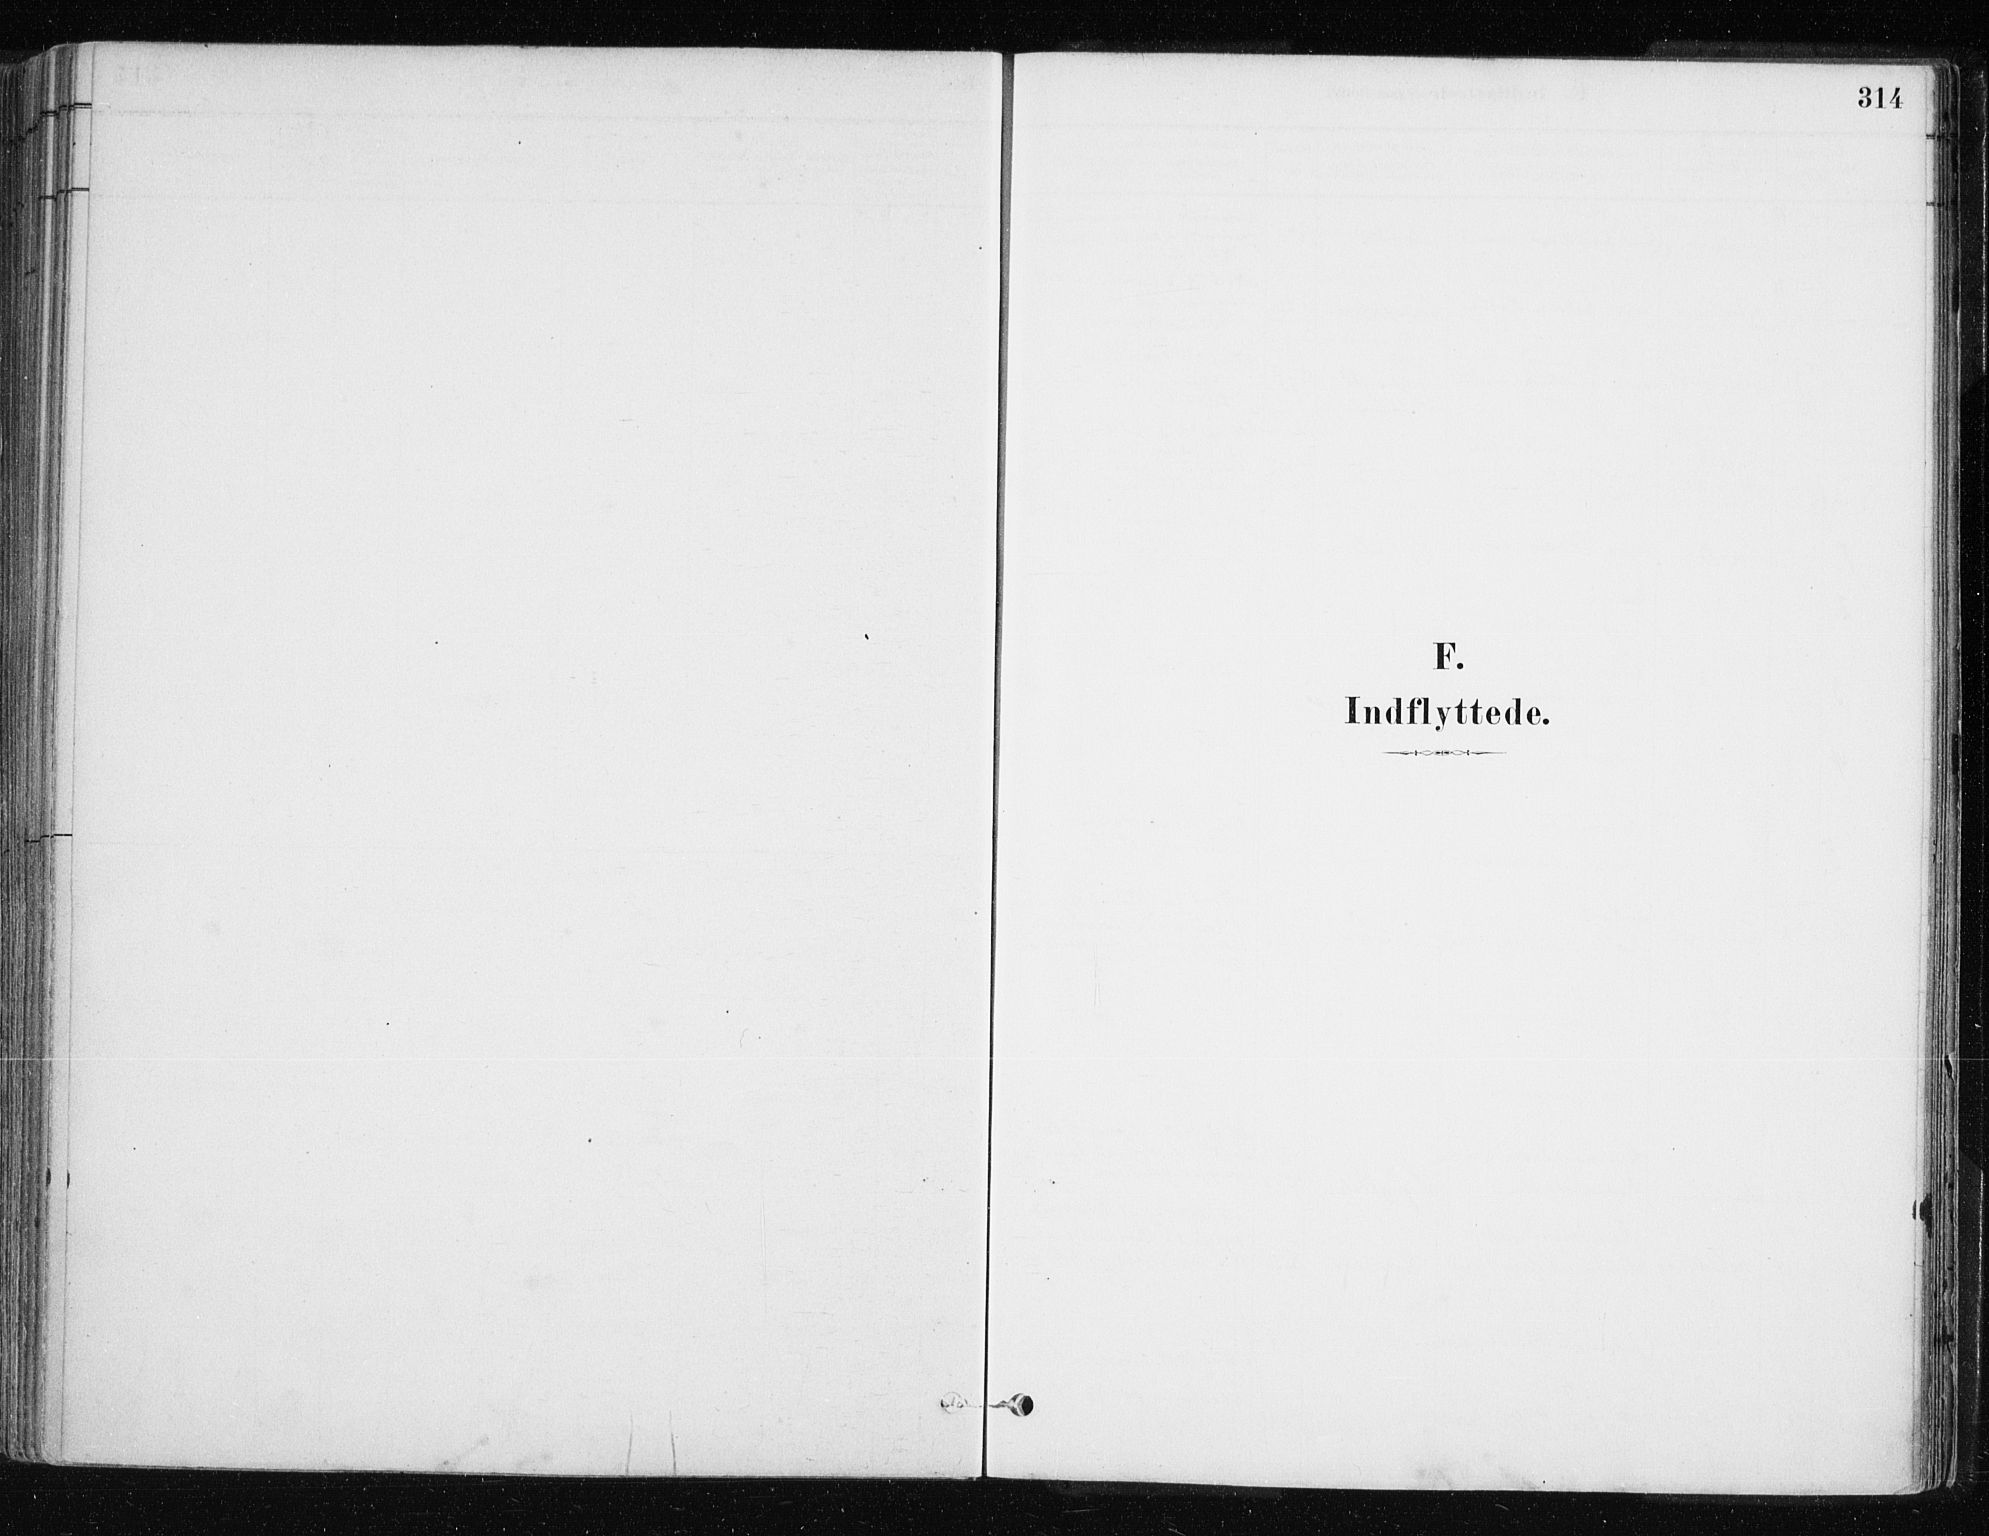 SATØ, Lyngen sokneprestembete, H/He/Hea/L0007kirke: Ministerialbok nr. 7, 1879-1890, s. 314